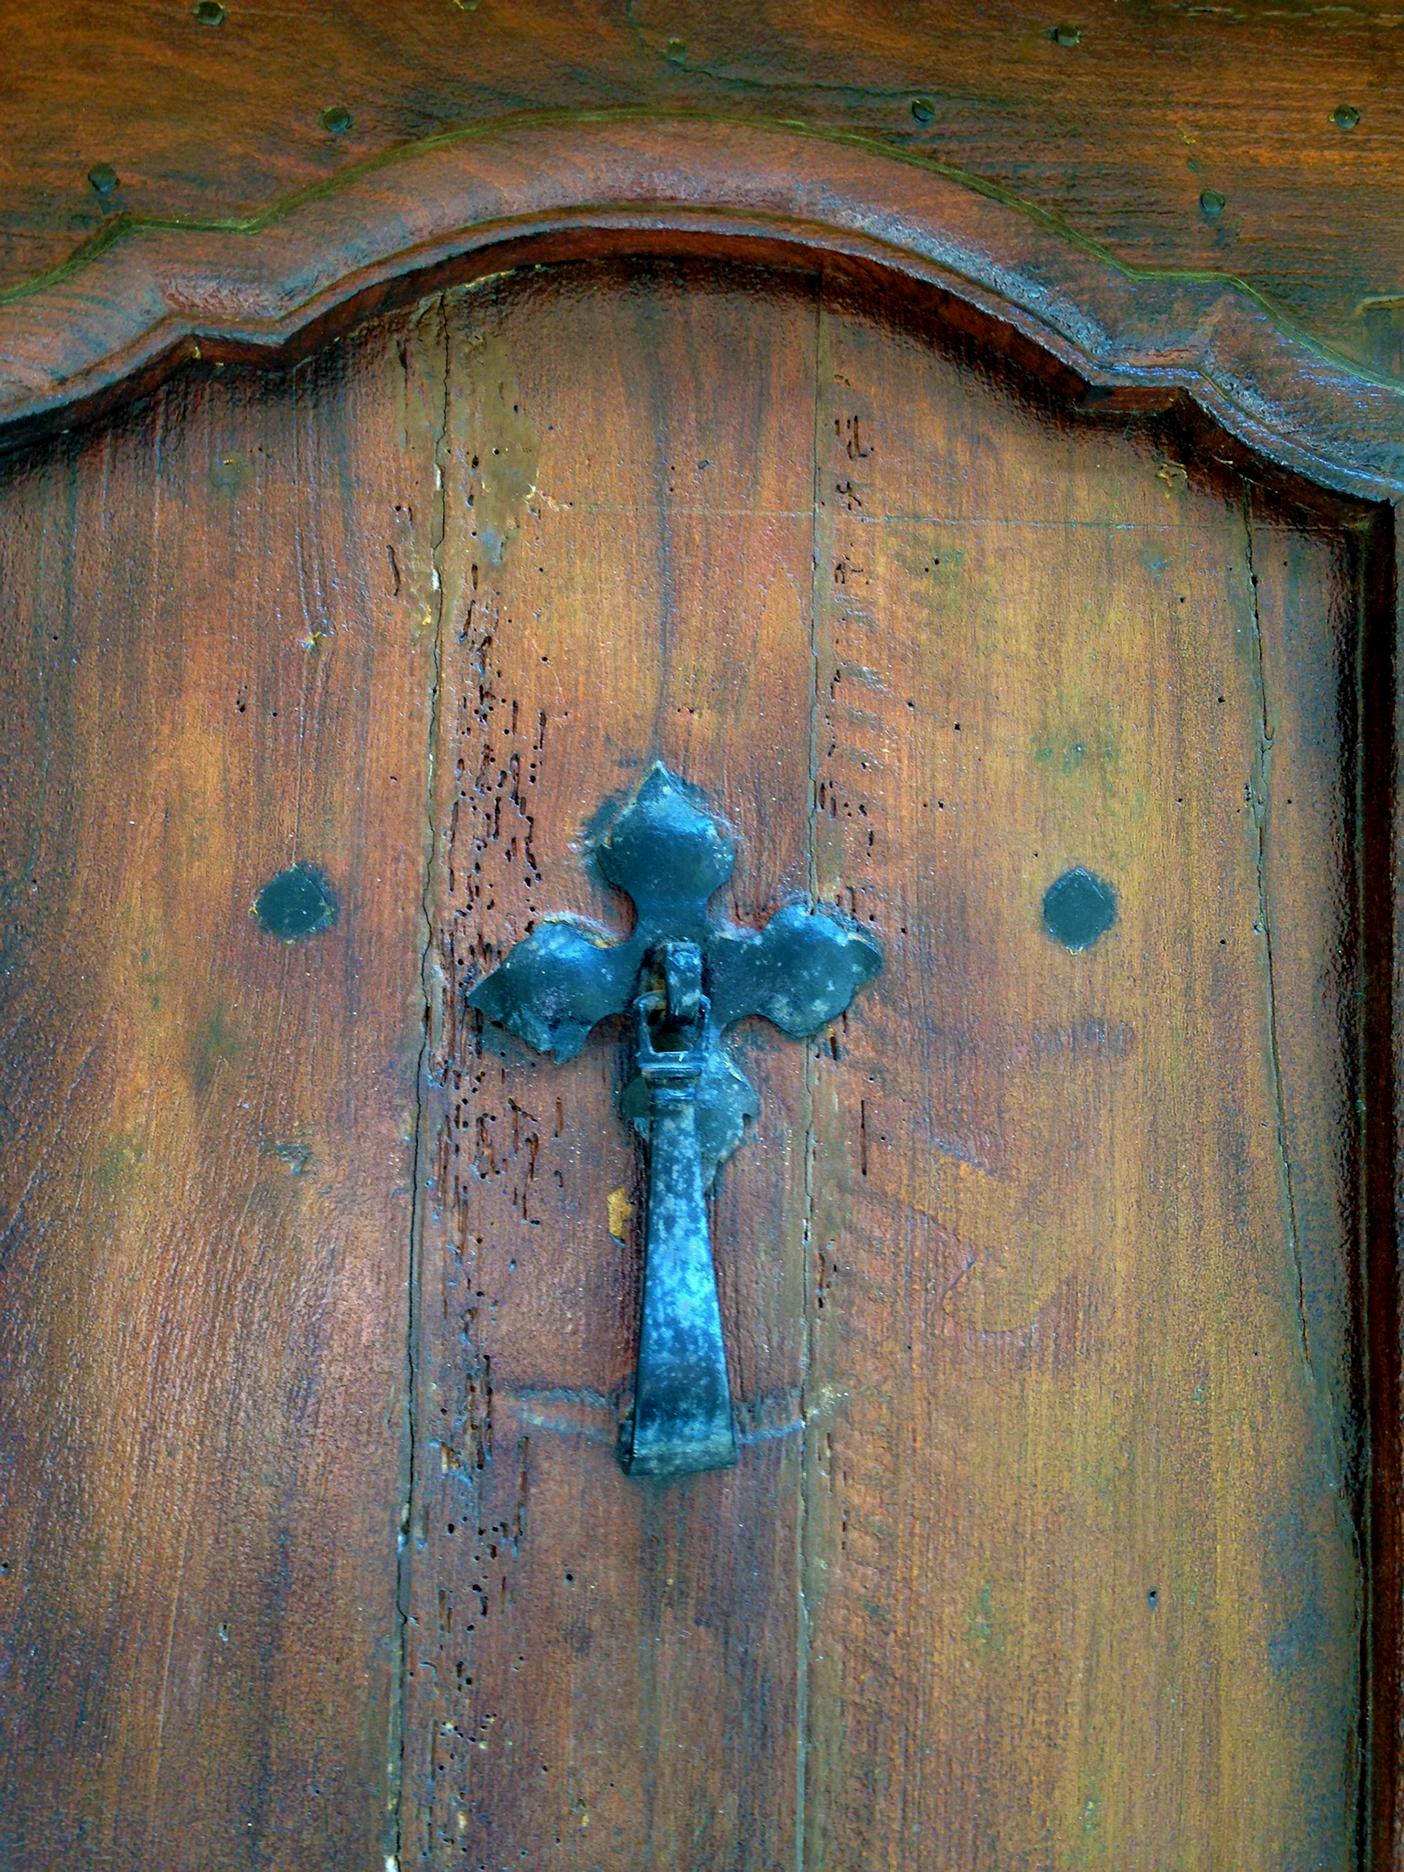 Hammer-style door knocker. Looks pretty old...